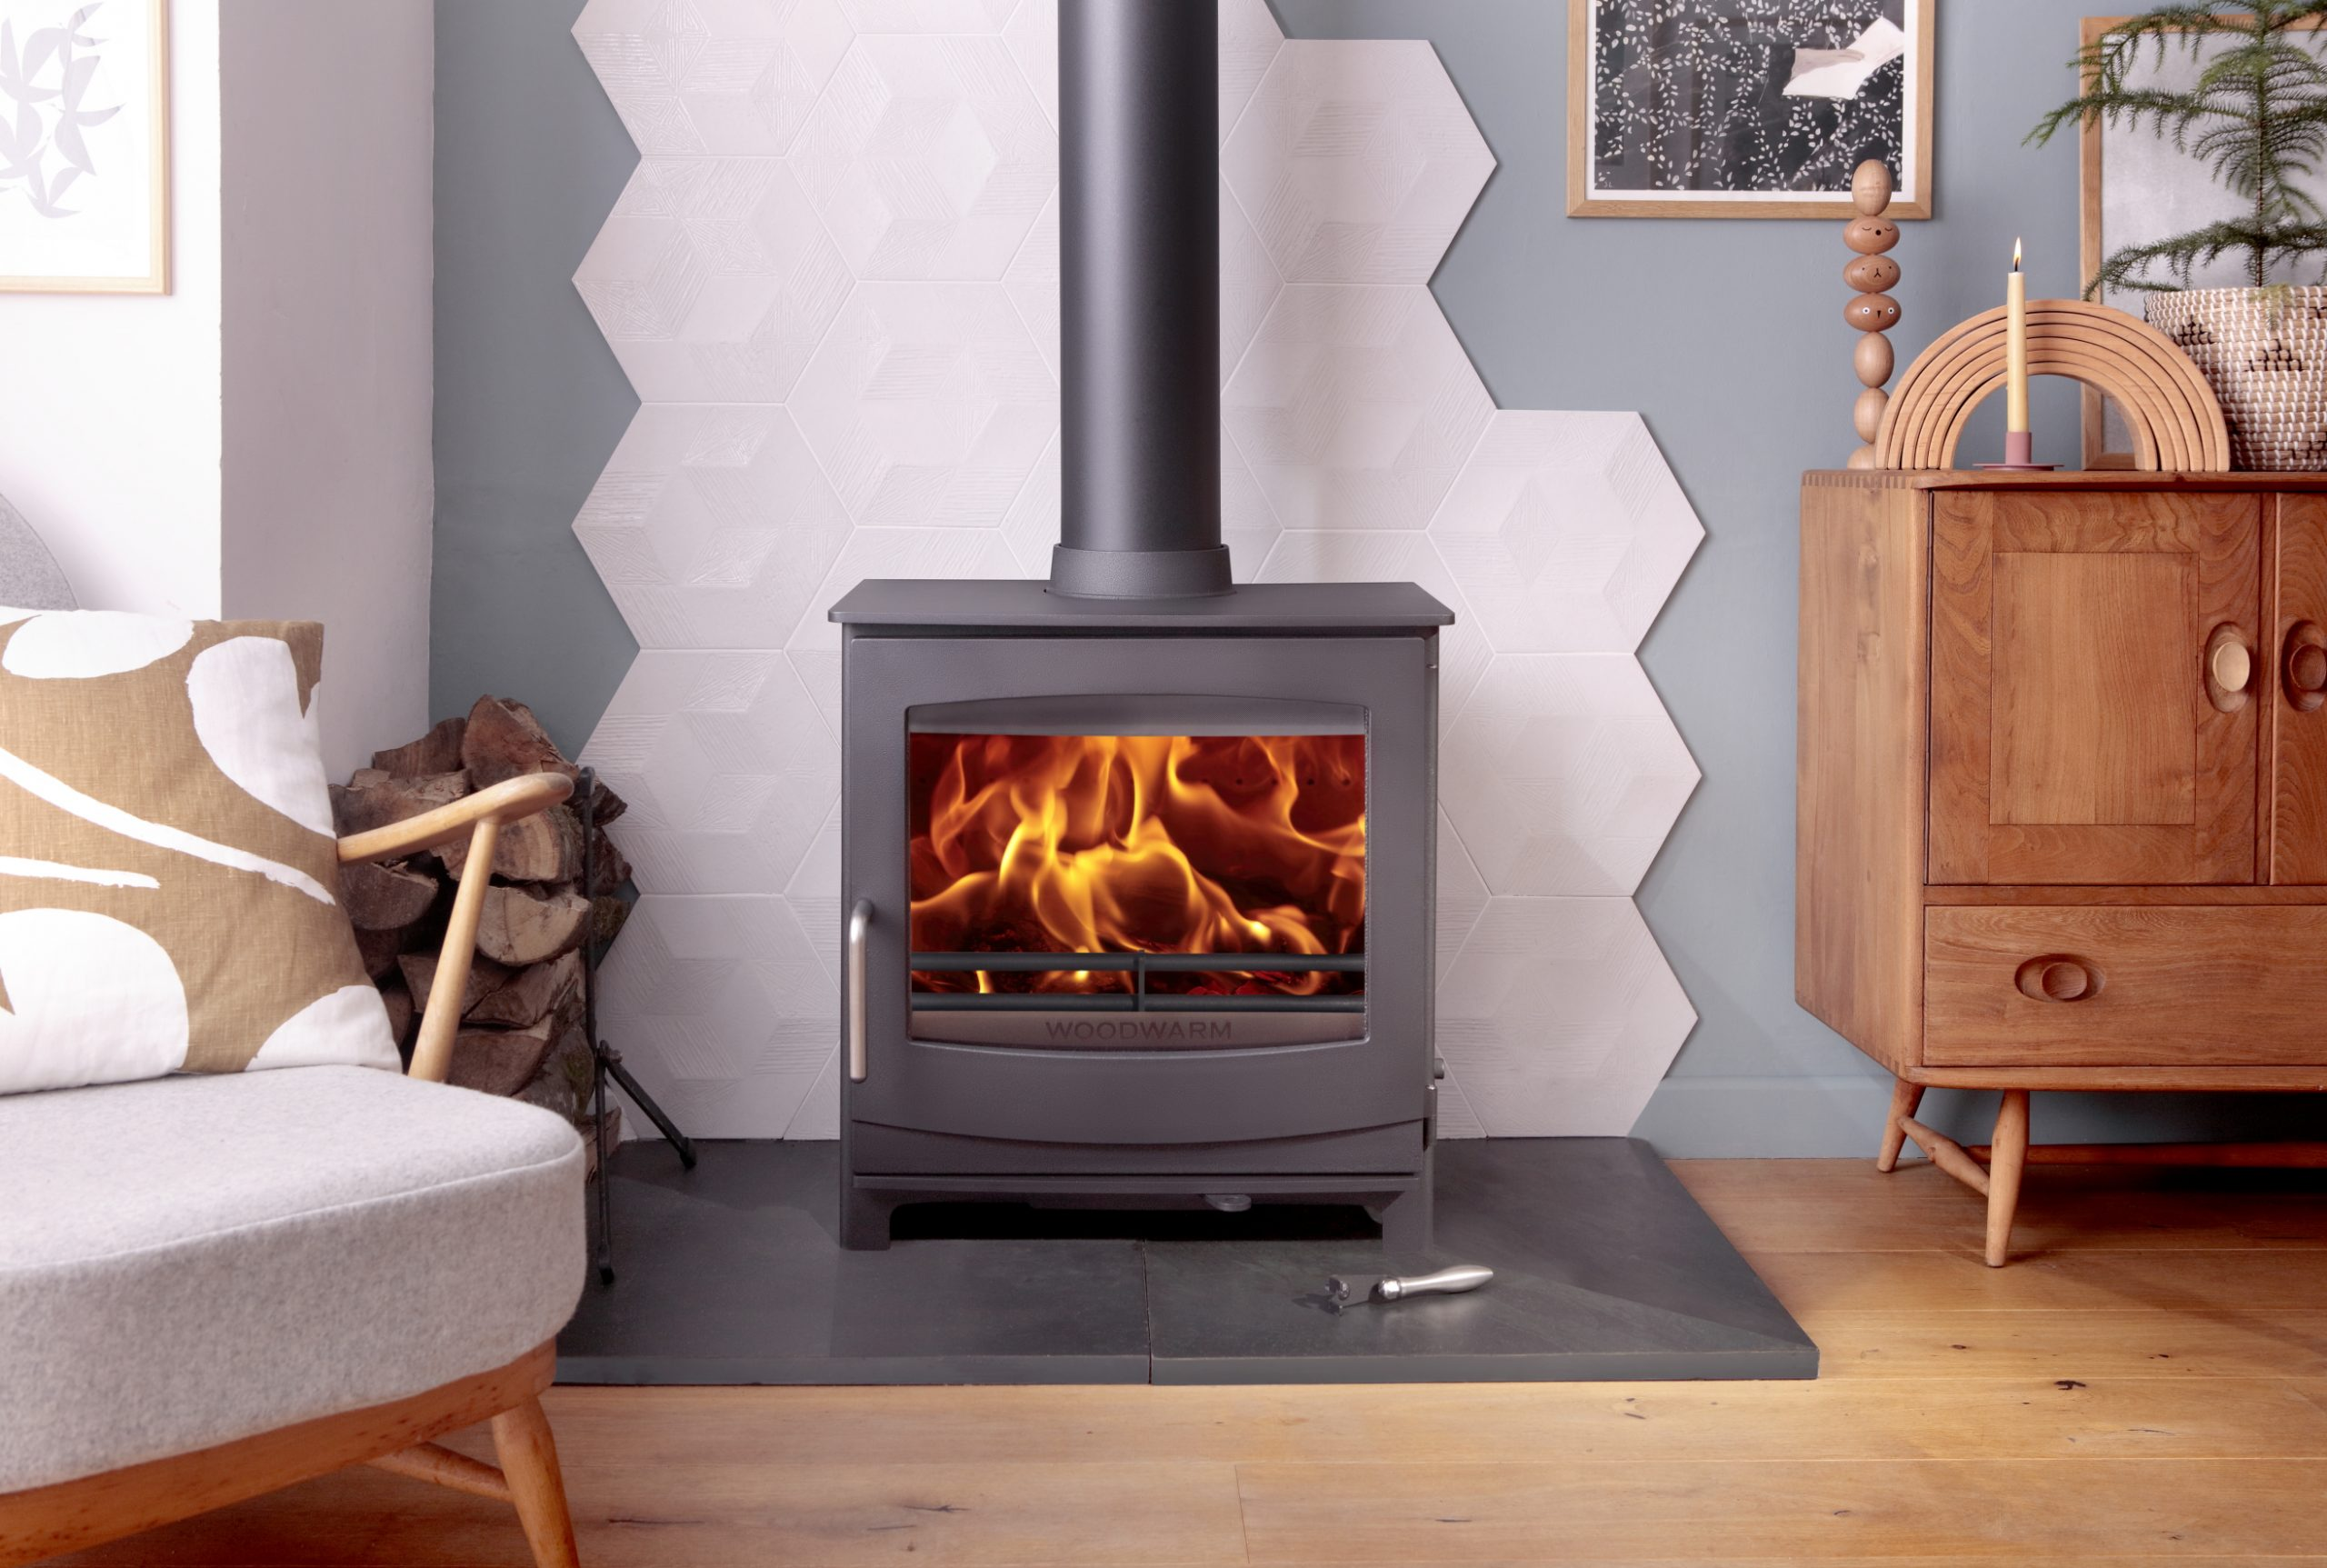 Woodwarm Fireview ECO 5kw